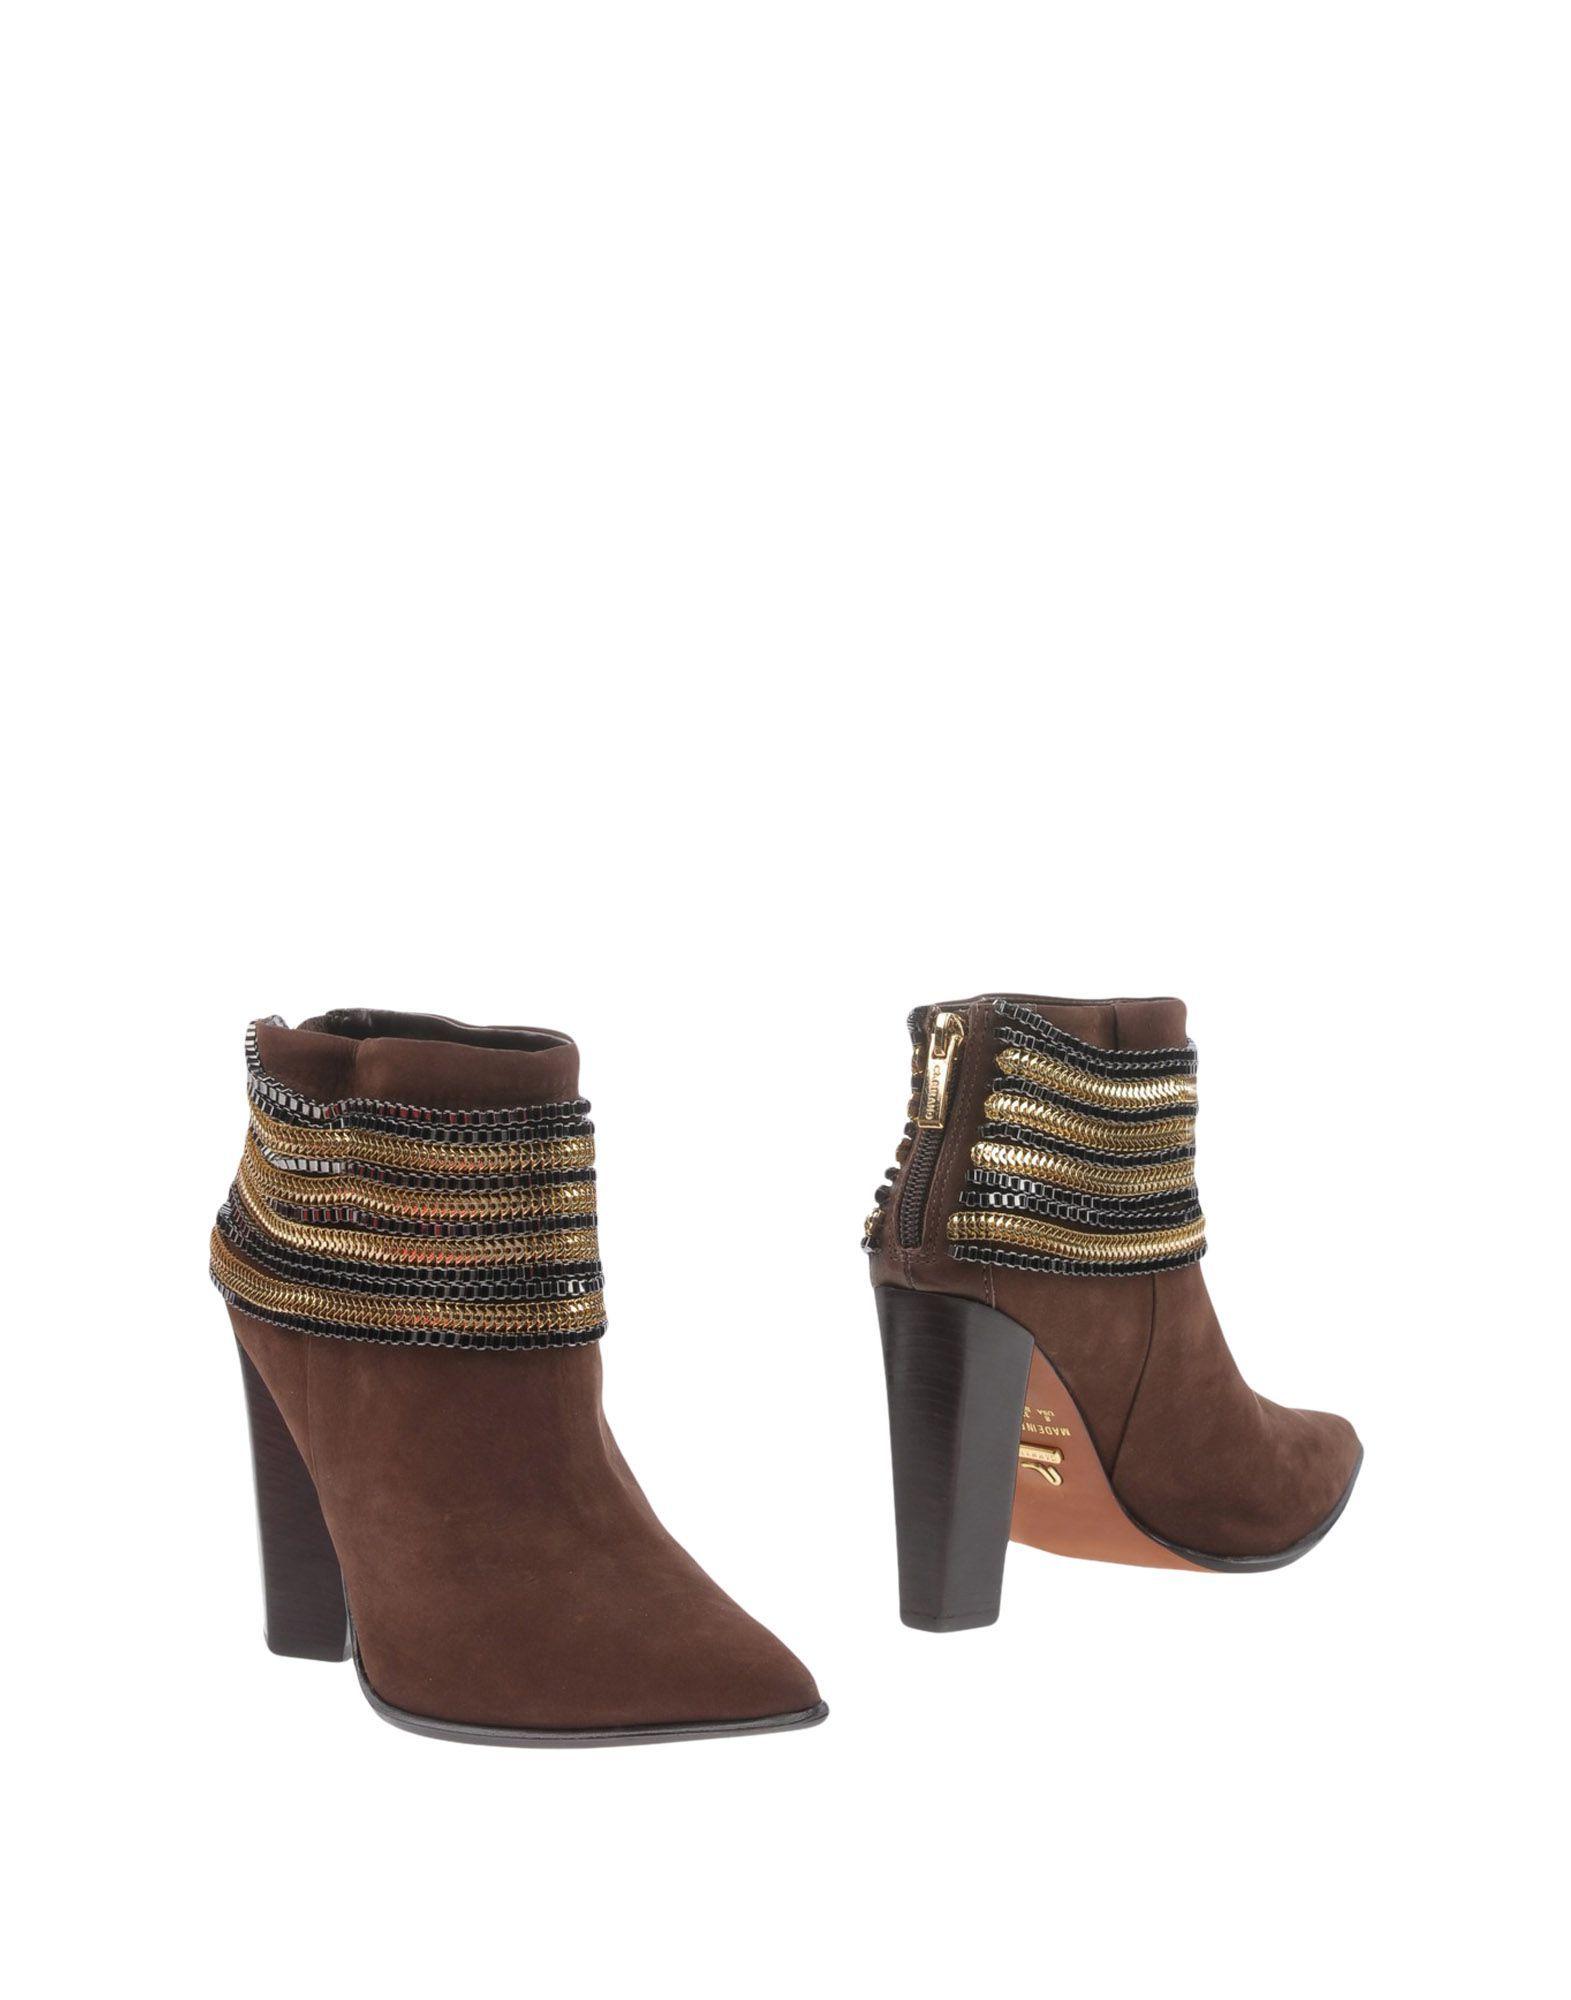 d7fd3266312cf CARRANO .  carrano  shoes